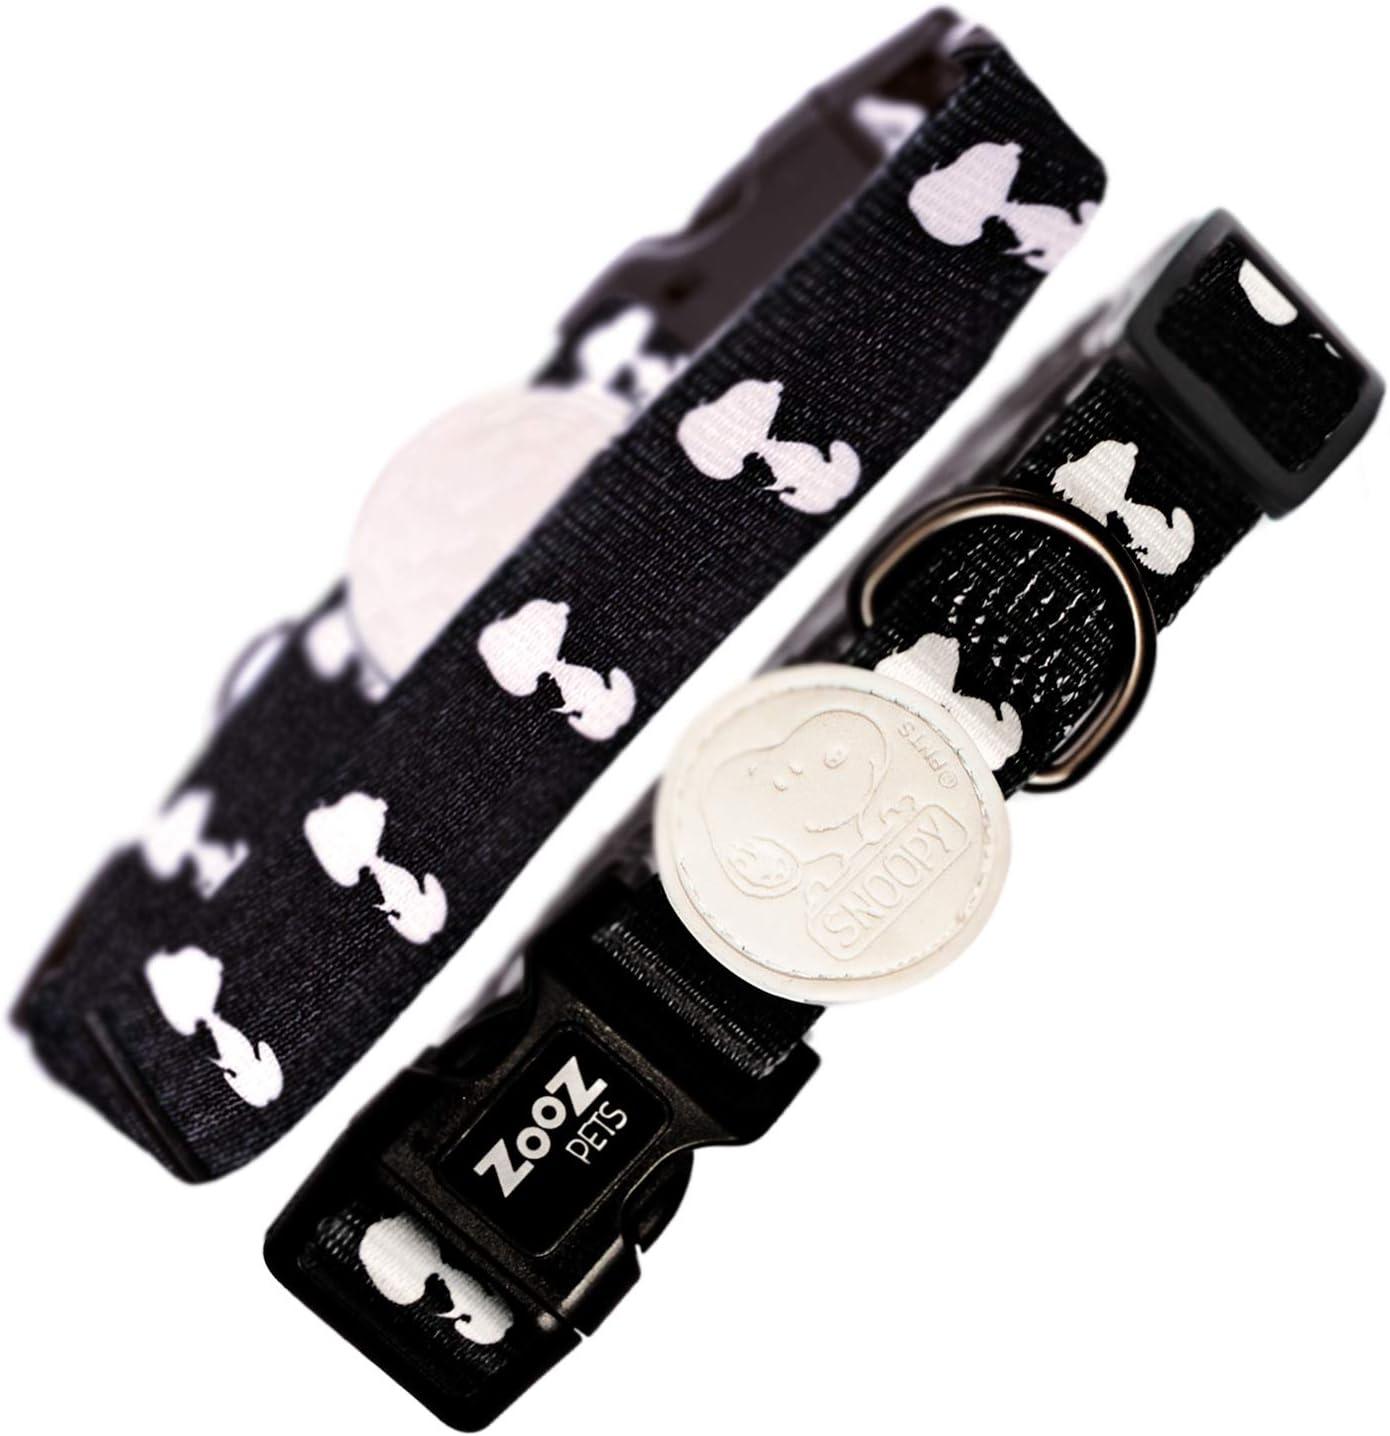 ZOOZ PETS Snoopy Dog Collar Tulsa Mall - New product type C Collars Slip Non Adjustable